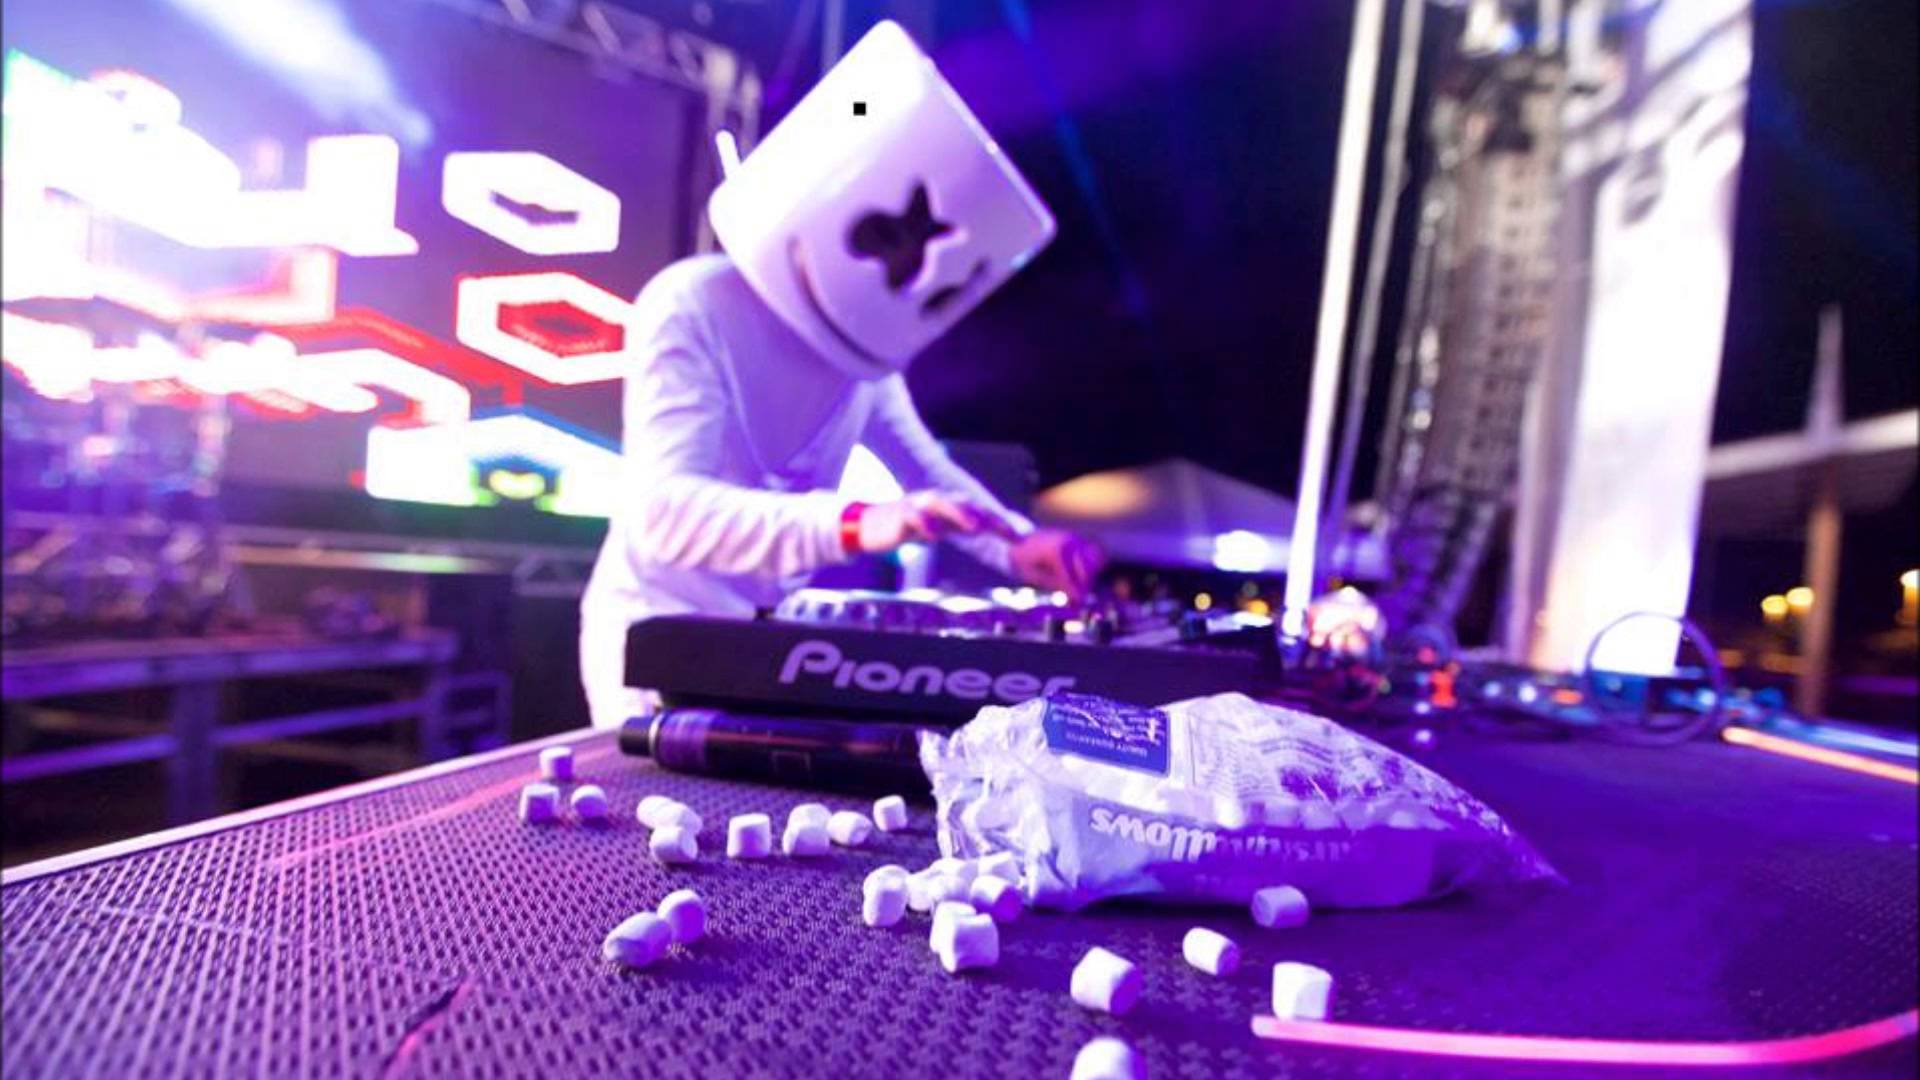 73+] Marshmello DJ Wallpapers on WallpaperSafari